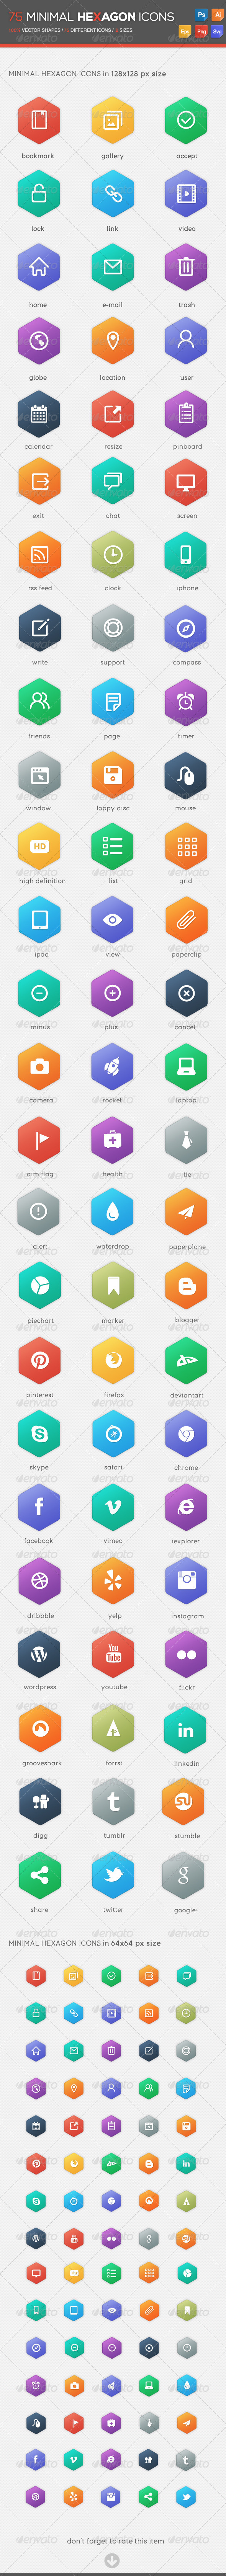 GraphicRiver 75 Minimal Hexagon Icons 4852360